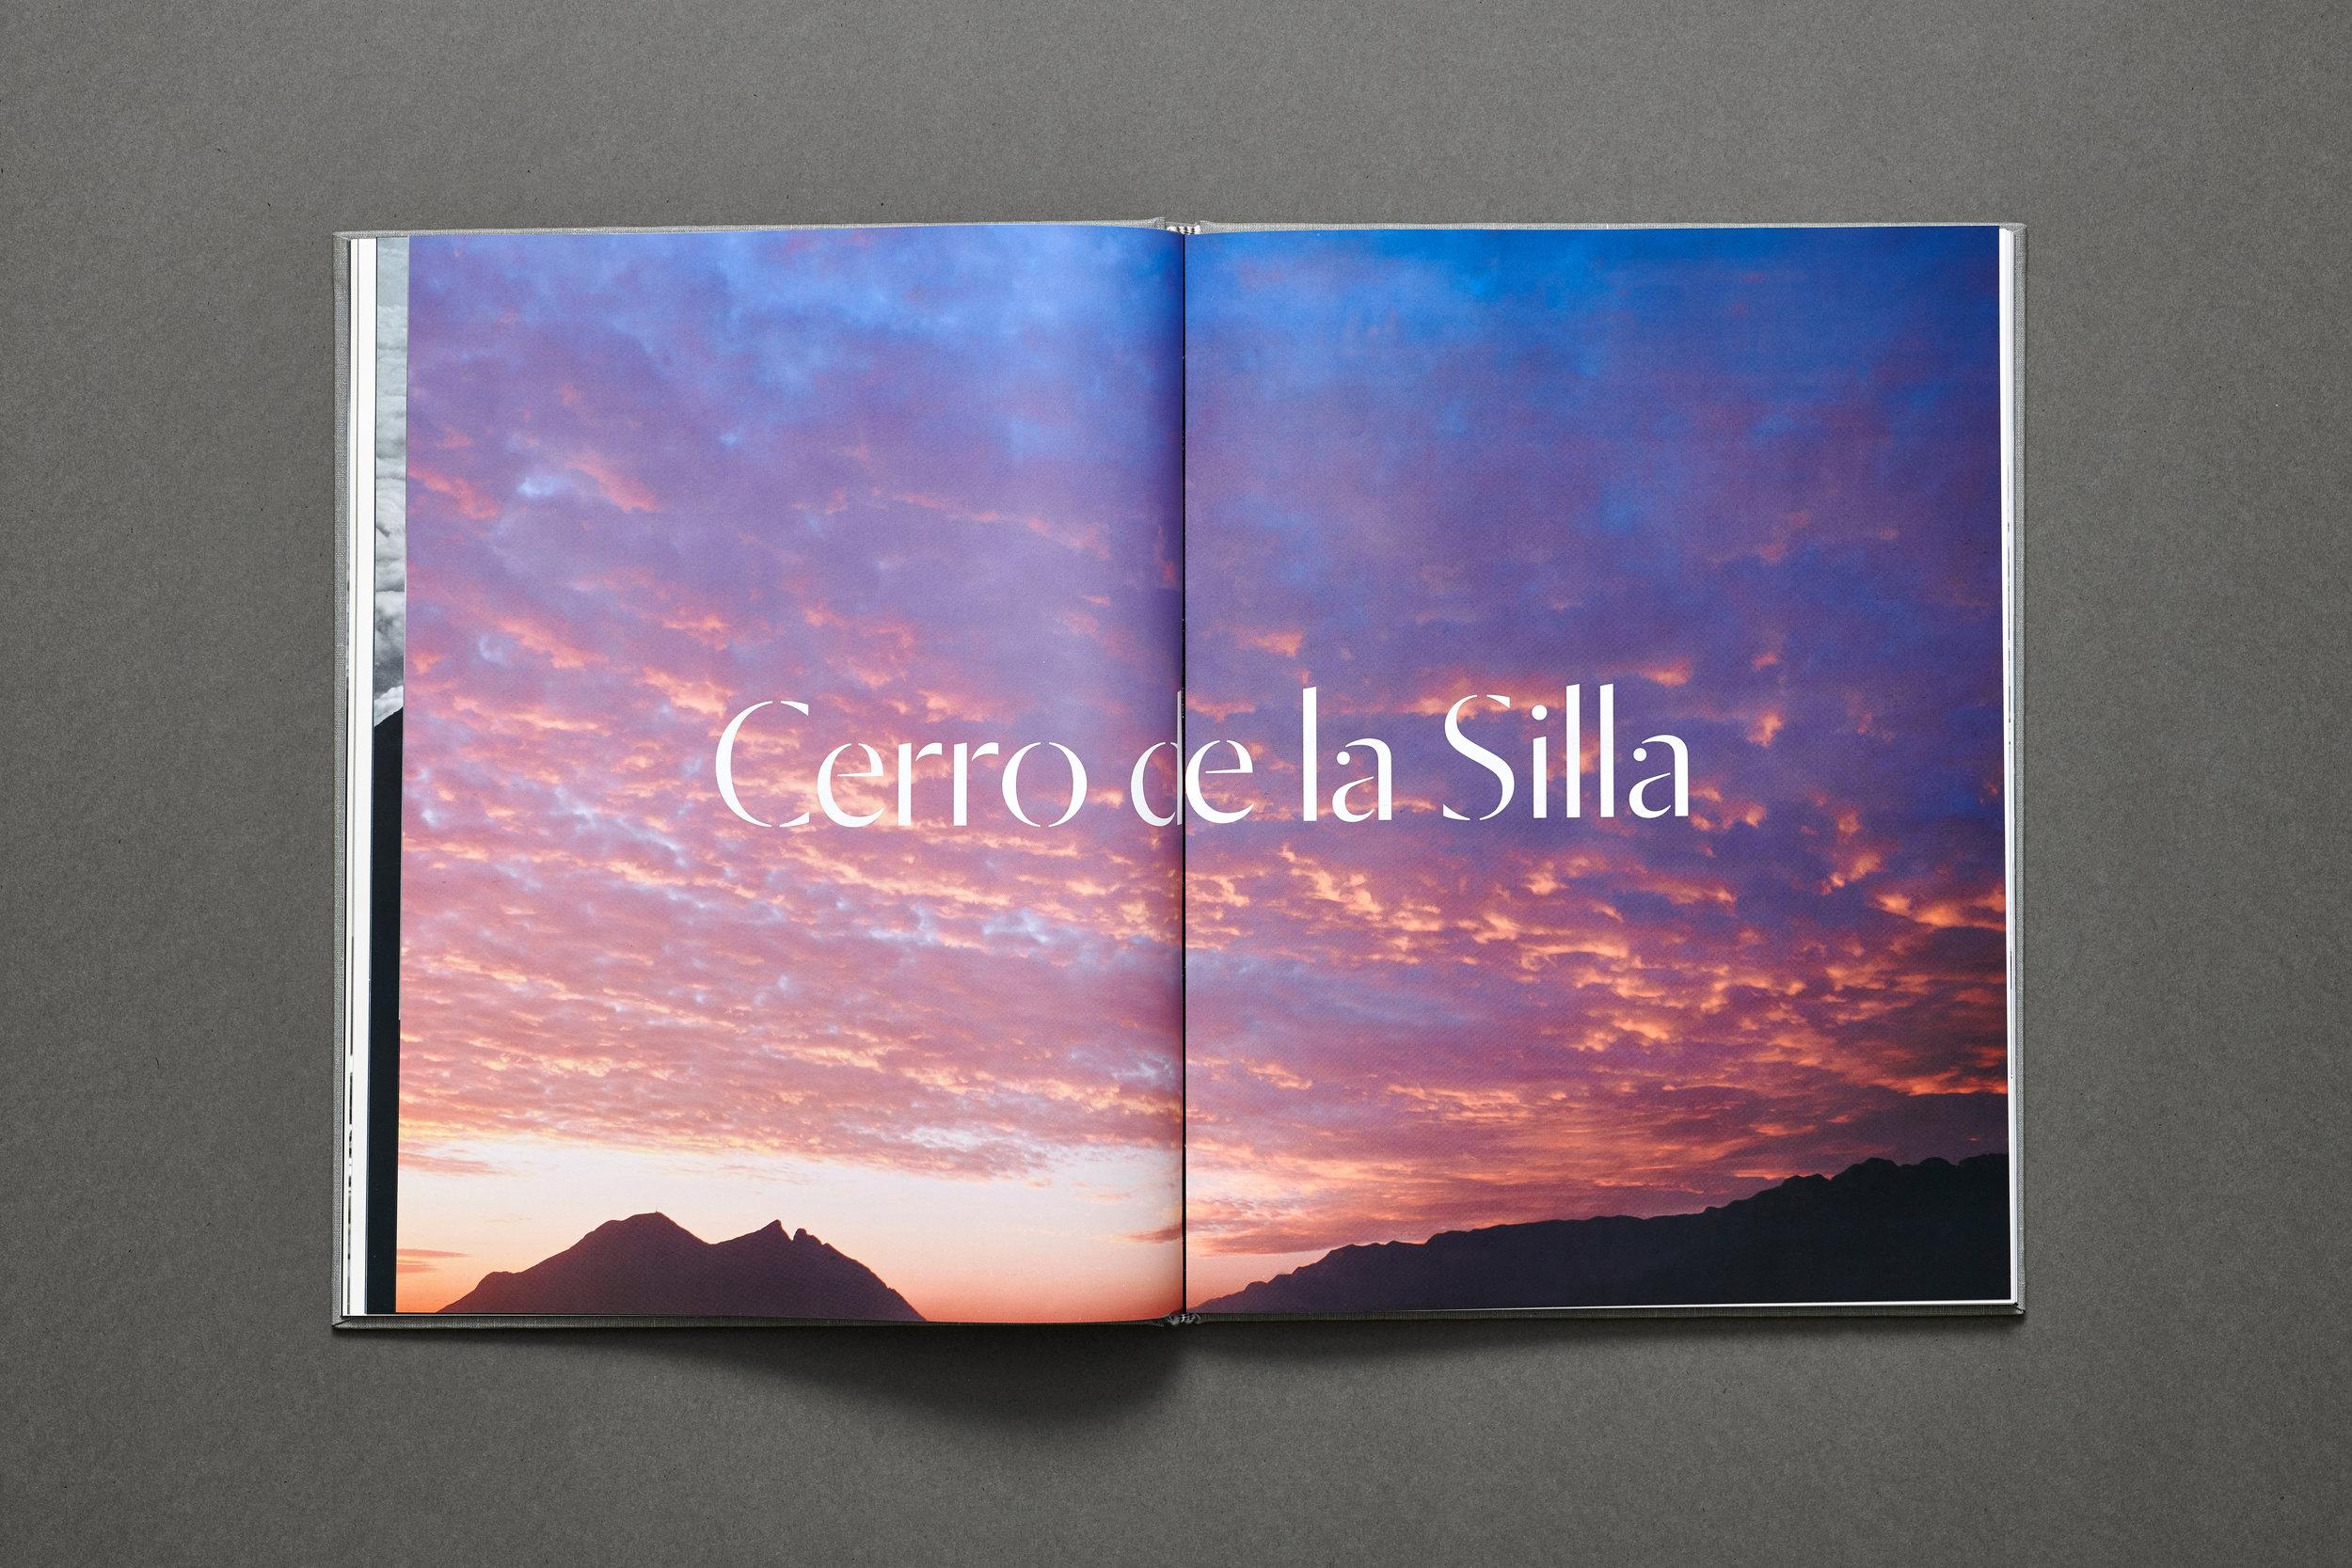 LAT_Ikon_Libro_CerroSilla_gris.jpg